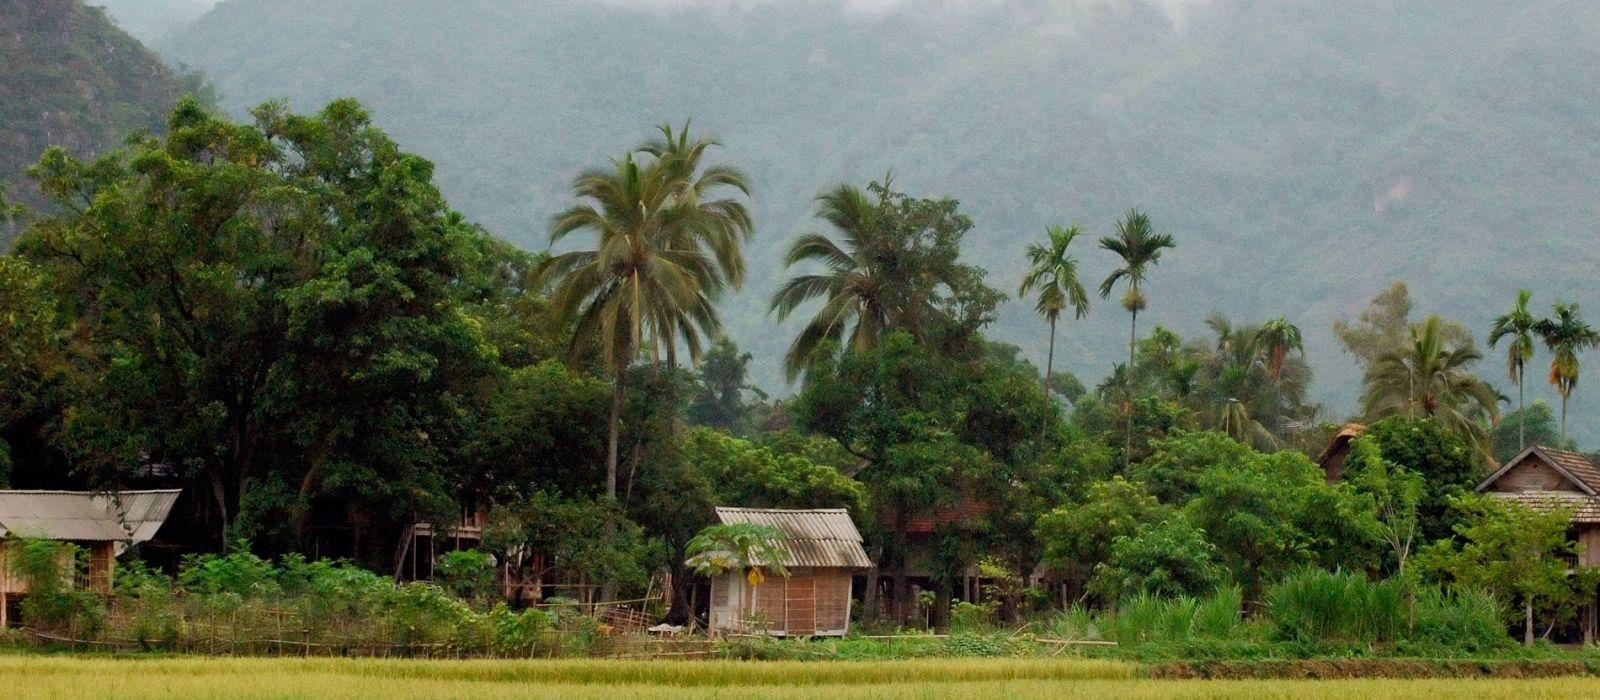 Reiseziel Mai Chau Vietnam